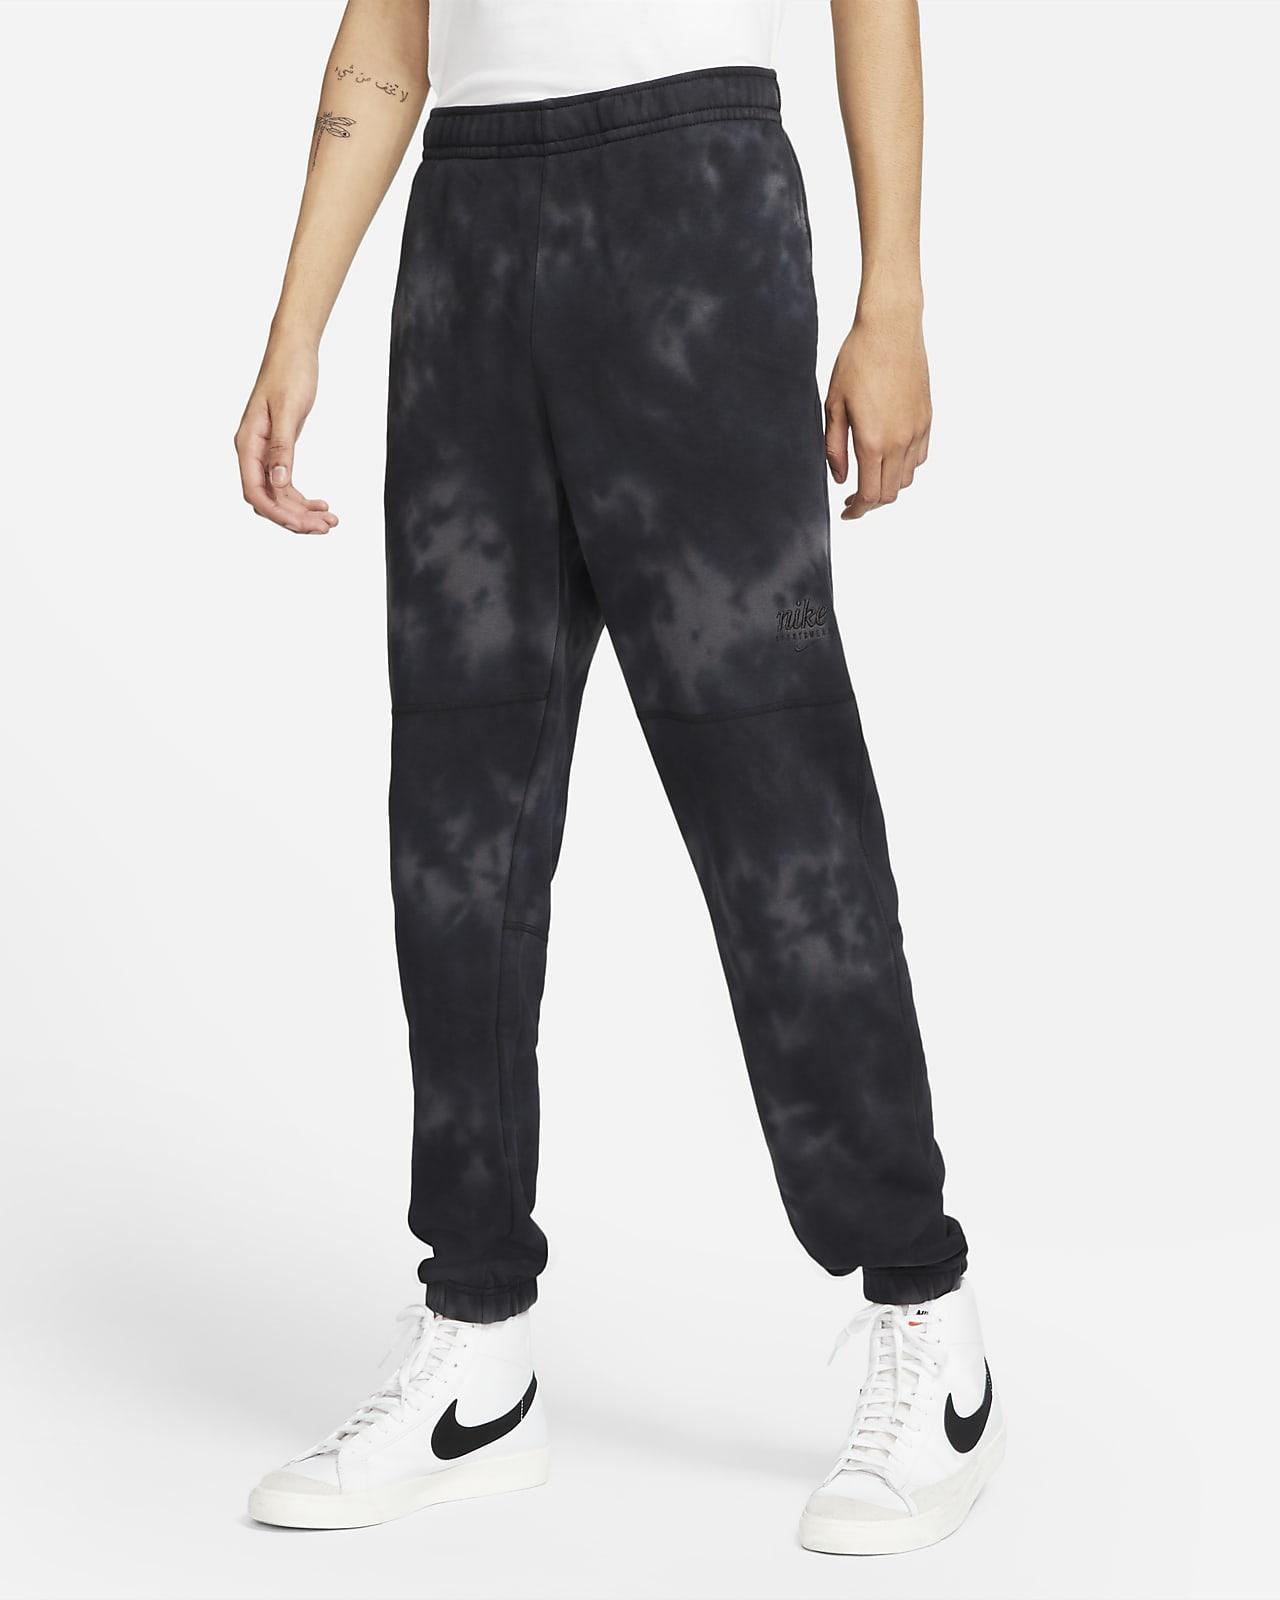 Pantalones de felpa francesa teñidos para hombre Nike Sportswear Club